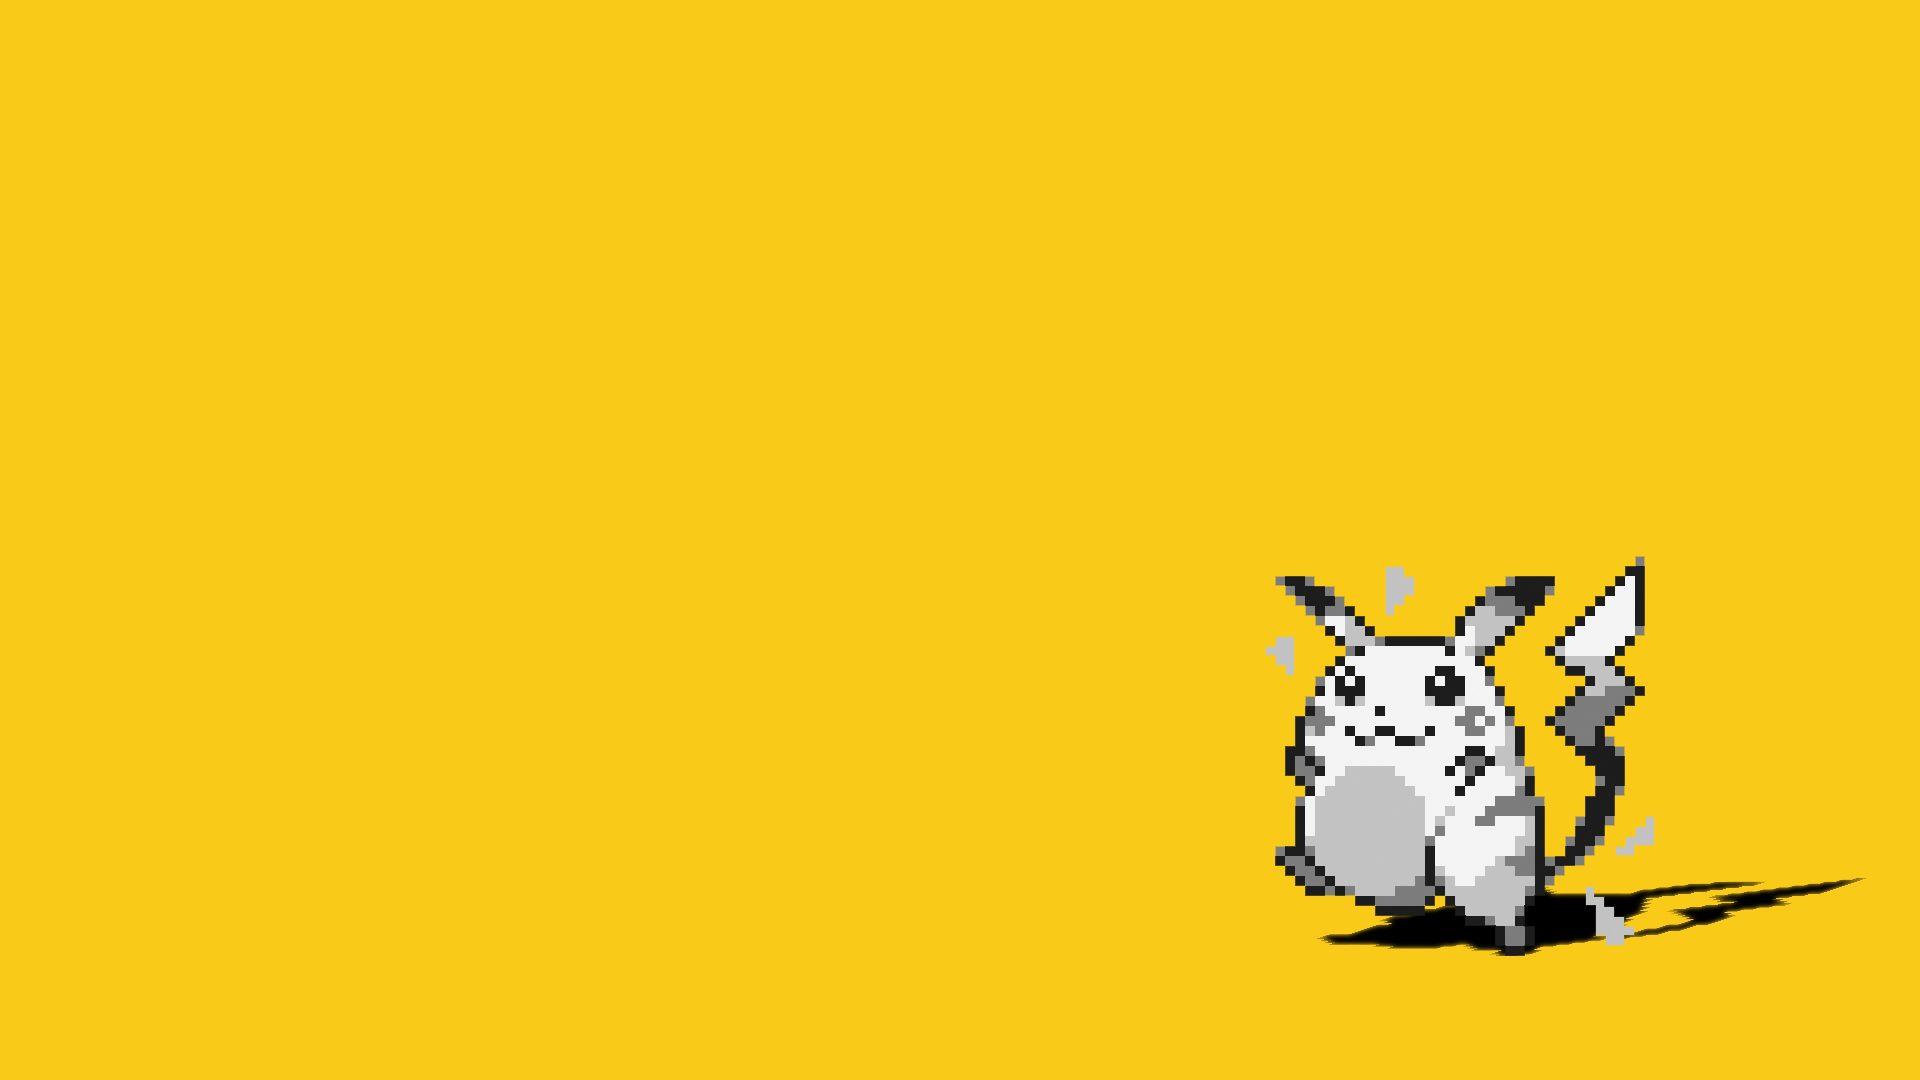 Pikachu Hd Wallpaper 1920x1080 Id 45391 Pikachu Wallpaper Cute Pokemon Wallpaper Pokemon